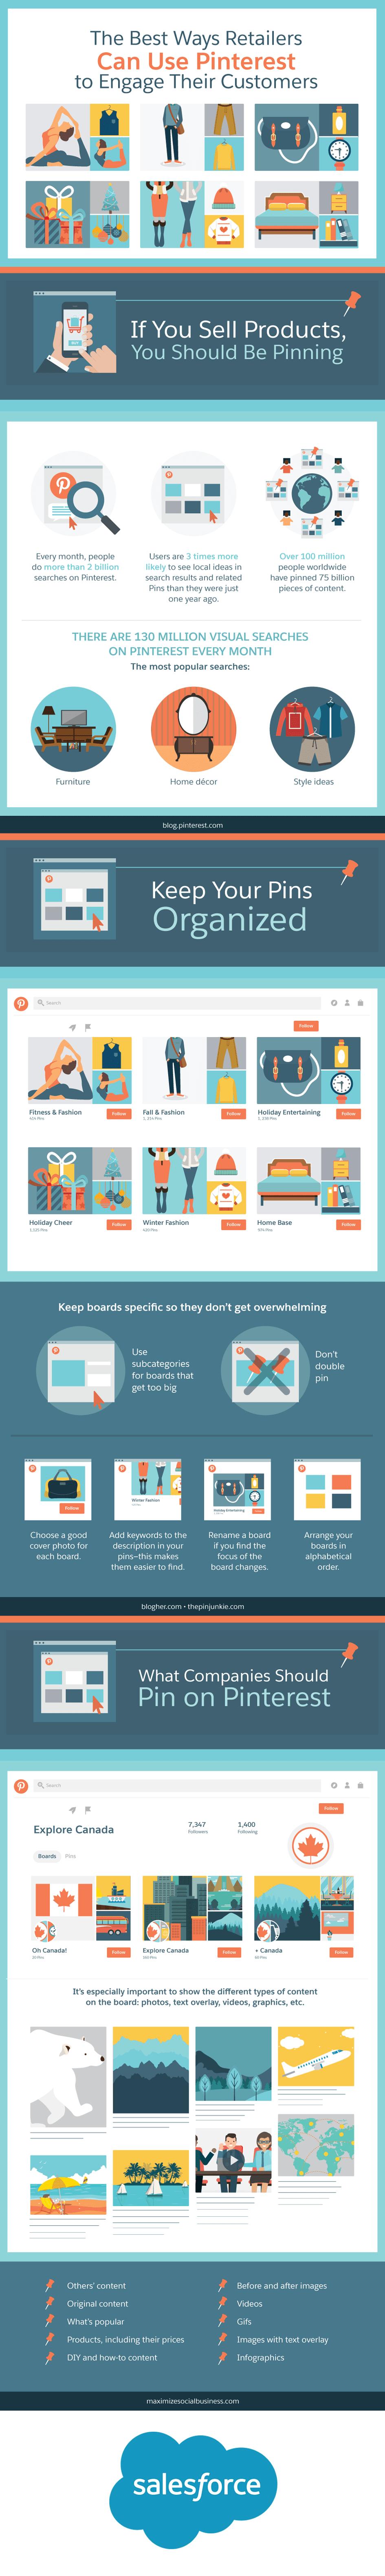 Consejos para utilizar Pinterest si eres empresario.